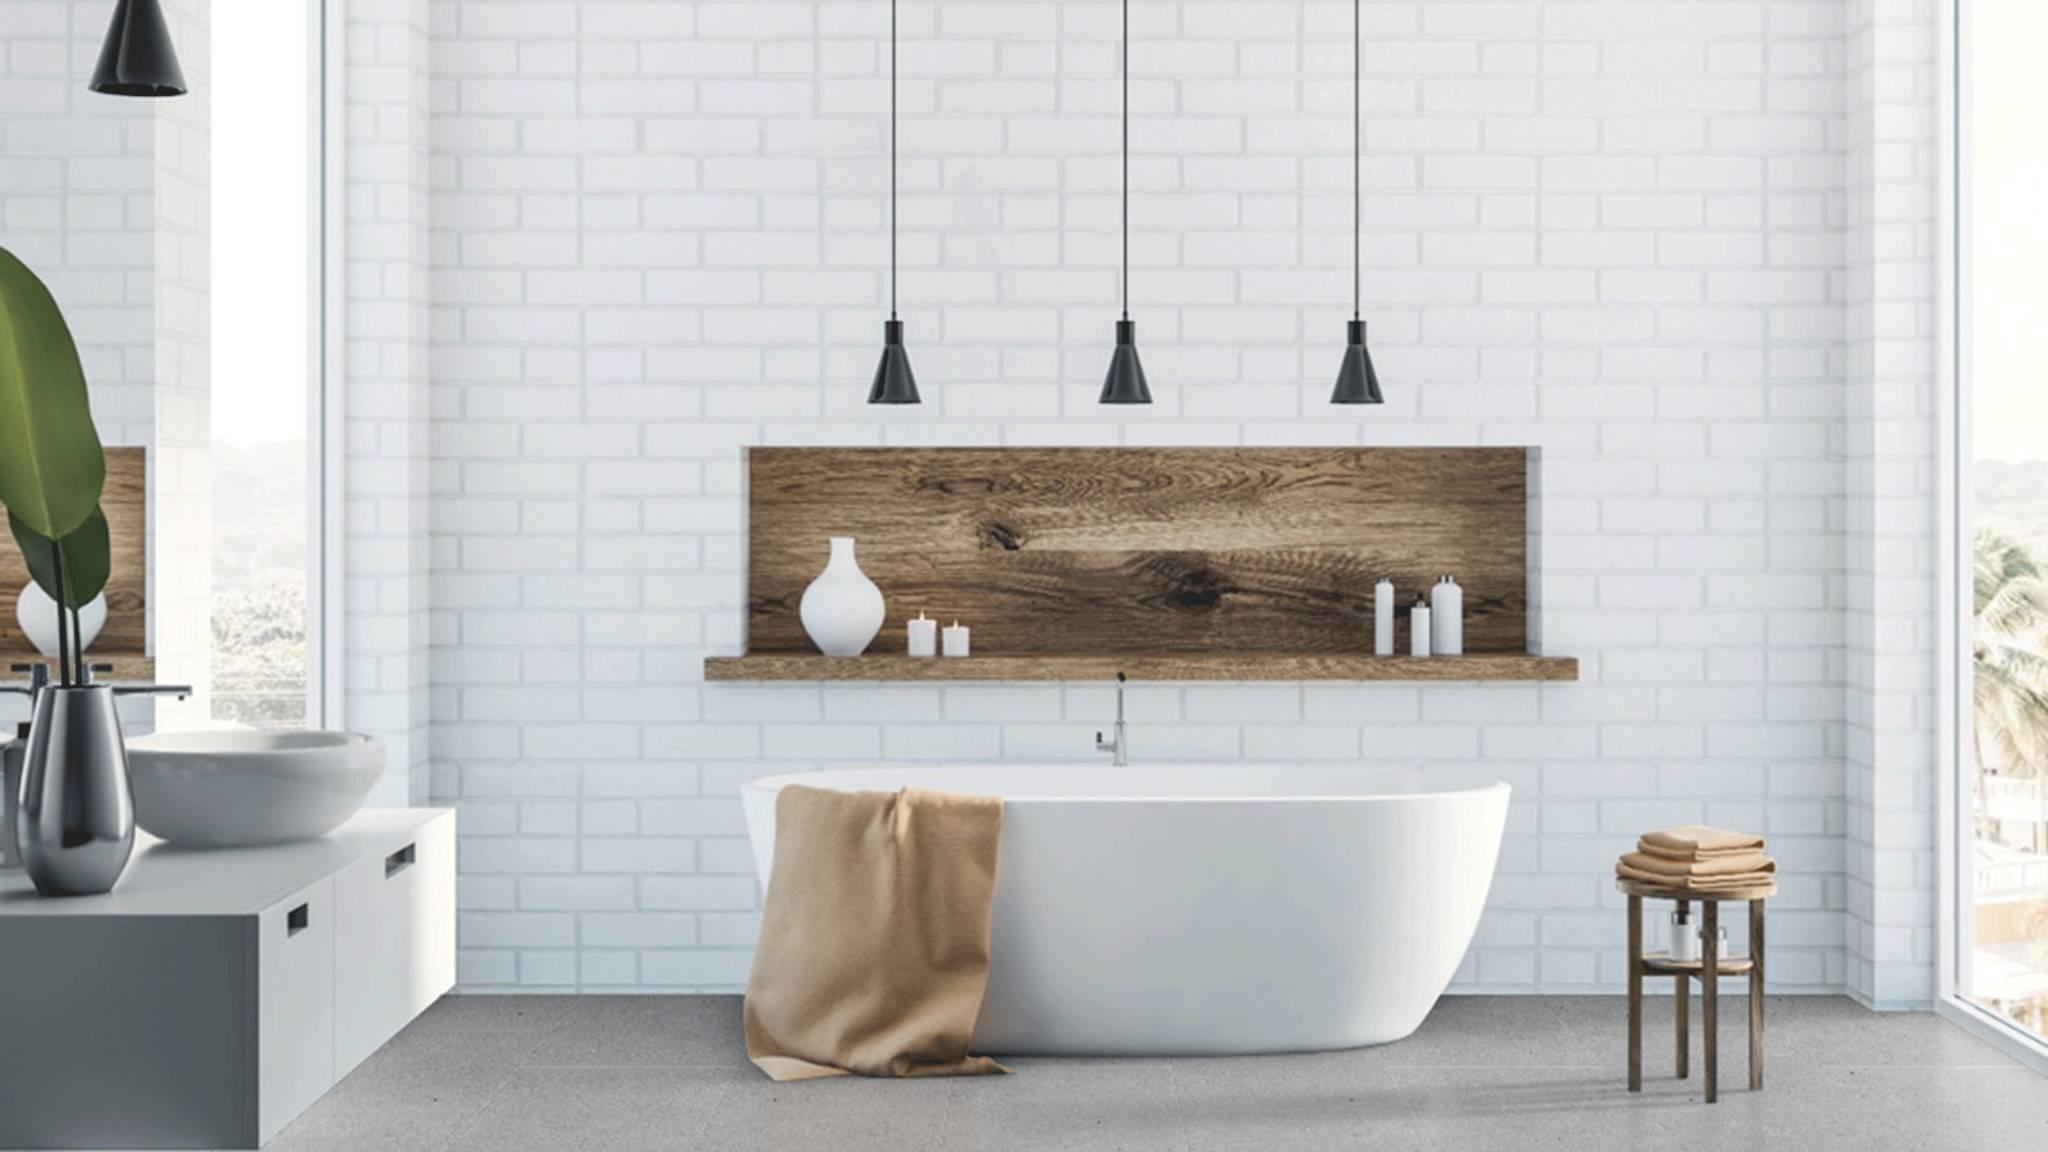 Large white soaking tub